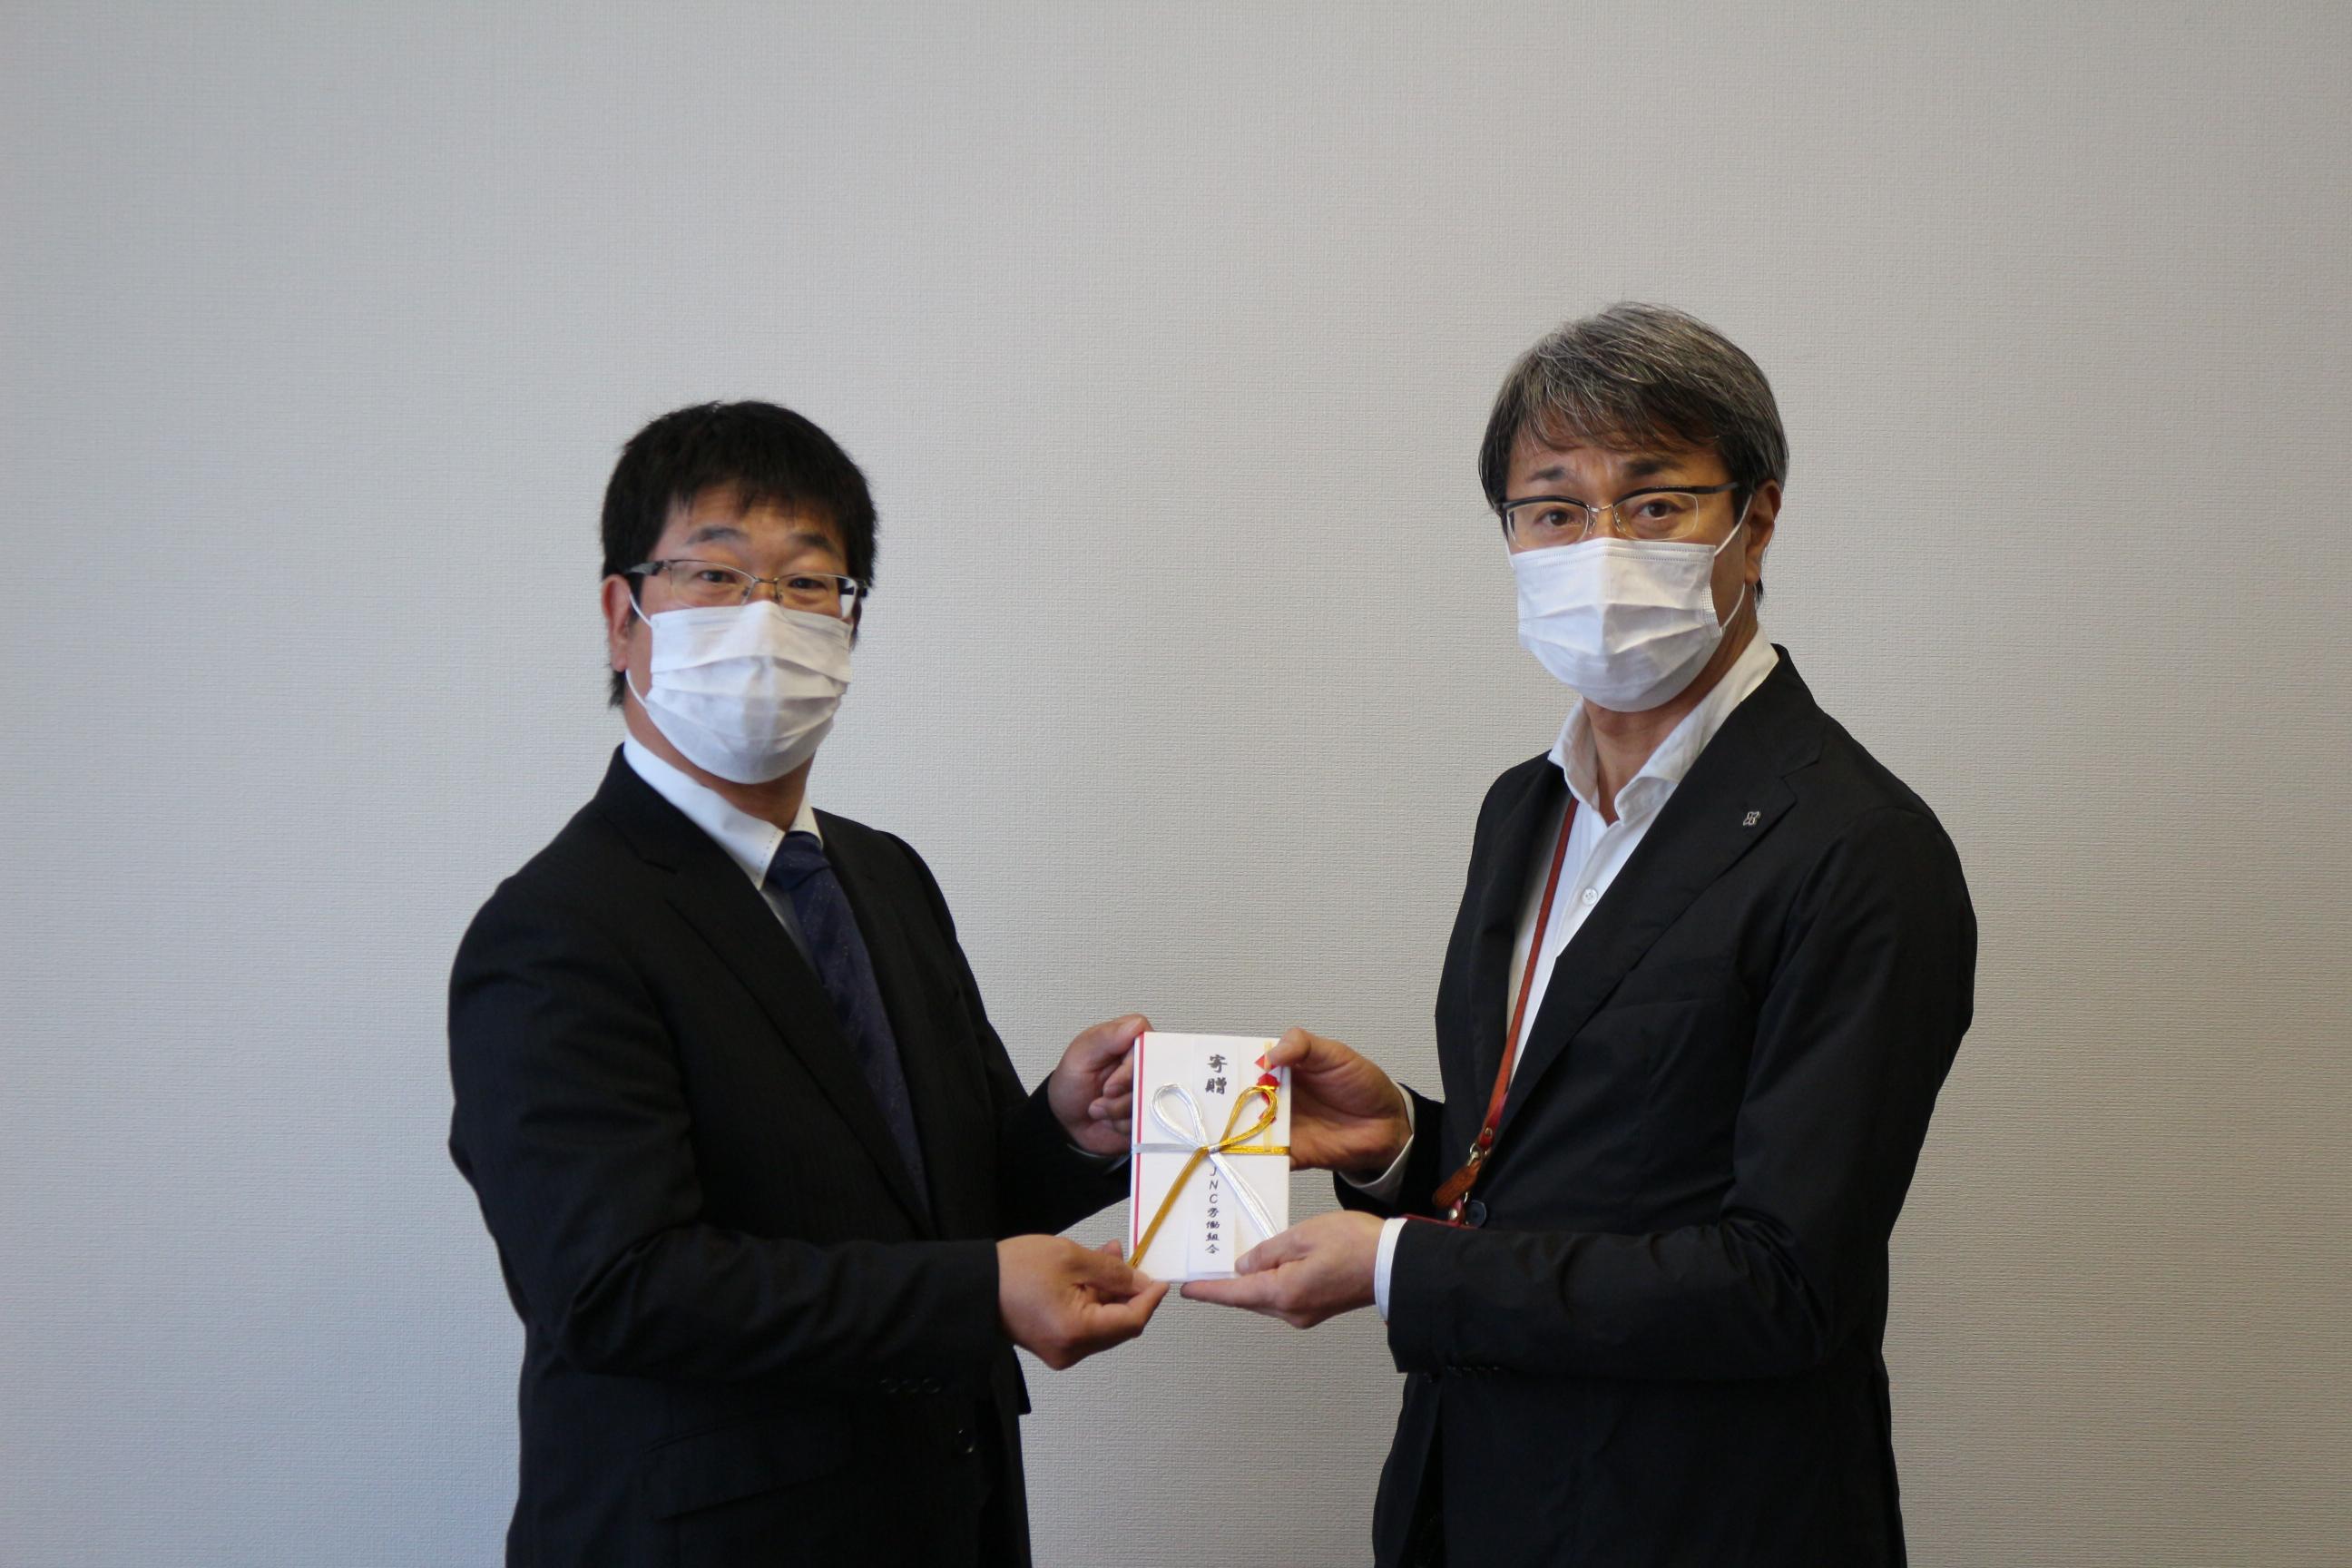 https://www.kourinkai.jp/contents/news/IMG_7525.JPG